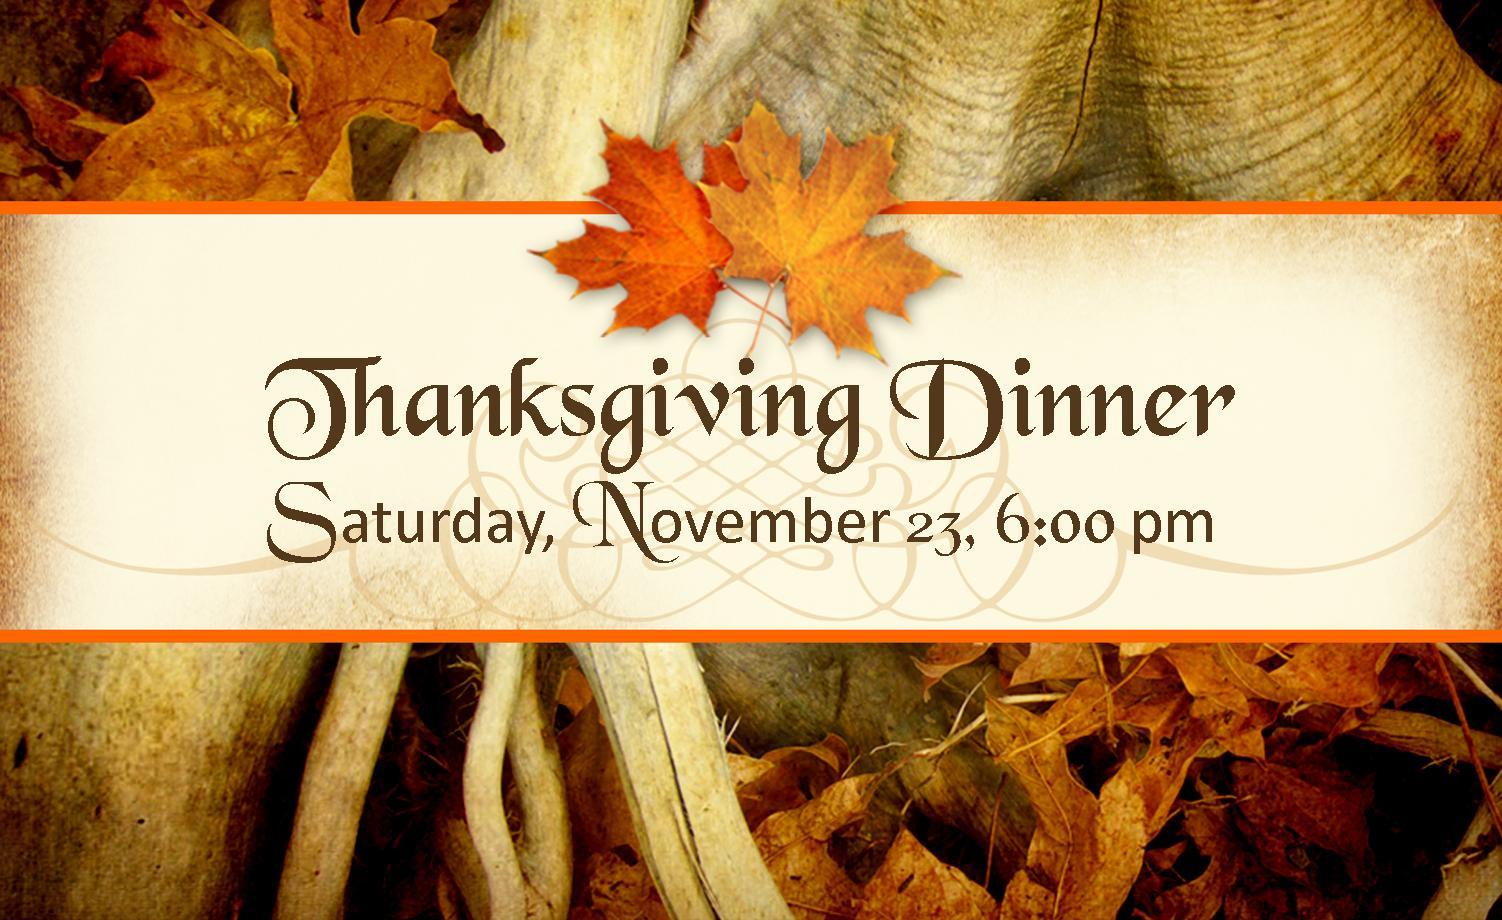 Thanksgiving Dinner Our Annual Church Family